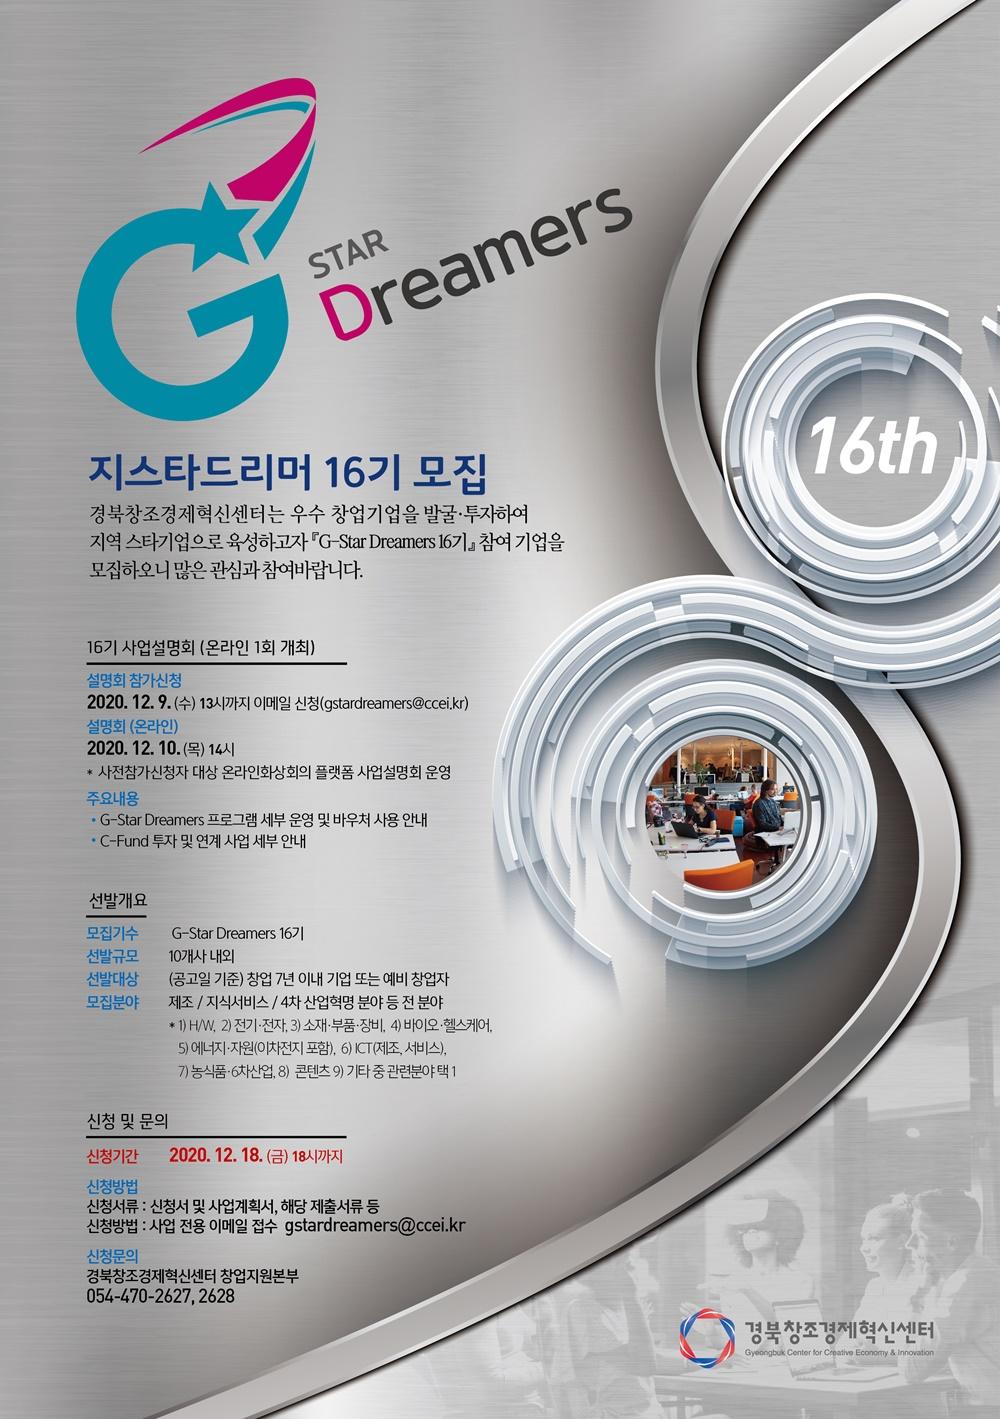 G STAR Dreamers 지스타드리머 16기 모집 경북창조경제혁신센터는 우수 창업기업을 발굴·투자하여 지역 스타기업으로 육성하고자 G STAR Dreamers 16기 참여 기업을 모집하오니 많은 관심과 참여바랍니다. 16기 사업설명회(온라인 1회 개최) 설명회 참가신청 2020.12.9.(수) 13시까지 이메일 신청(gstardreamers@ccei.kr) 설명회(온라인) 2020.12.10.(목) 14시*사전참가 신청자 대상 온라인화상회의 플랫폼 사업설명회 운영 주요내용 *G STAR Dreamers 프로그램 세부 운영 및 바우처 사용 안내 *C-FUND 투자 및 연계 사업 세부 안내 선발개요 모집기수 G STAR Dreamers 16기 선발규모 10개사 내외 선밸대상 (공고일 기준) 창업 7년 이내 기업 또는 예비 창업자 모집분야 제조 / 지식서비스 / 4차 산업혁명 분야 등 전 분야 1) H/W, 2)전기·전자, 3)소재·부품·장비, 4)바이오·헬스케어, 5)에너지·자원(이차전지 포함), 6)ICT(제조,서비스), 7)농식품·6차산업, 8)콘텐츠, 9)기타 중 관련분야 택 1 신청 및 문의 신청기간 2020.12.18(금) 18시까지 신청방법 신청서류: 신청서 및 사업계획서, 해당 제출서류 등 신청방법: 사업 전용 이메일 접수 gstardreamers@ccei.kr 신청문의 경북창조경제혁신센터 창업지원본부 054-470-2627,2628 경북창조경제혁신센터